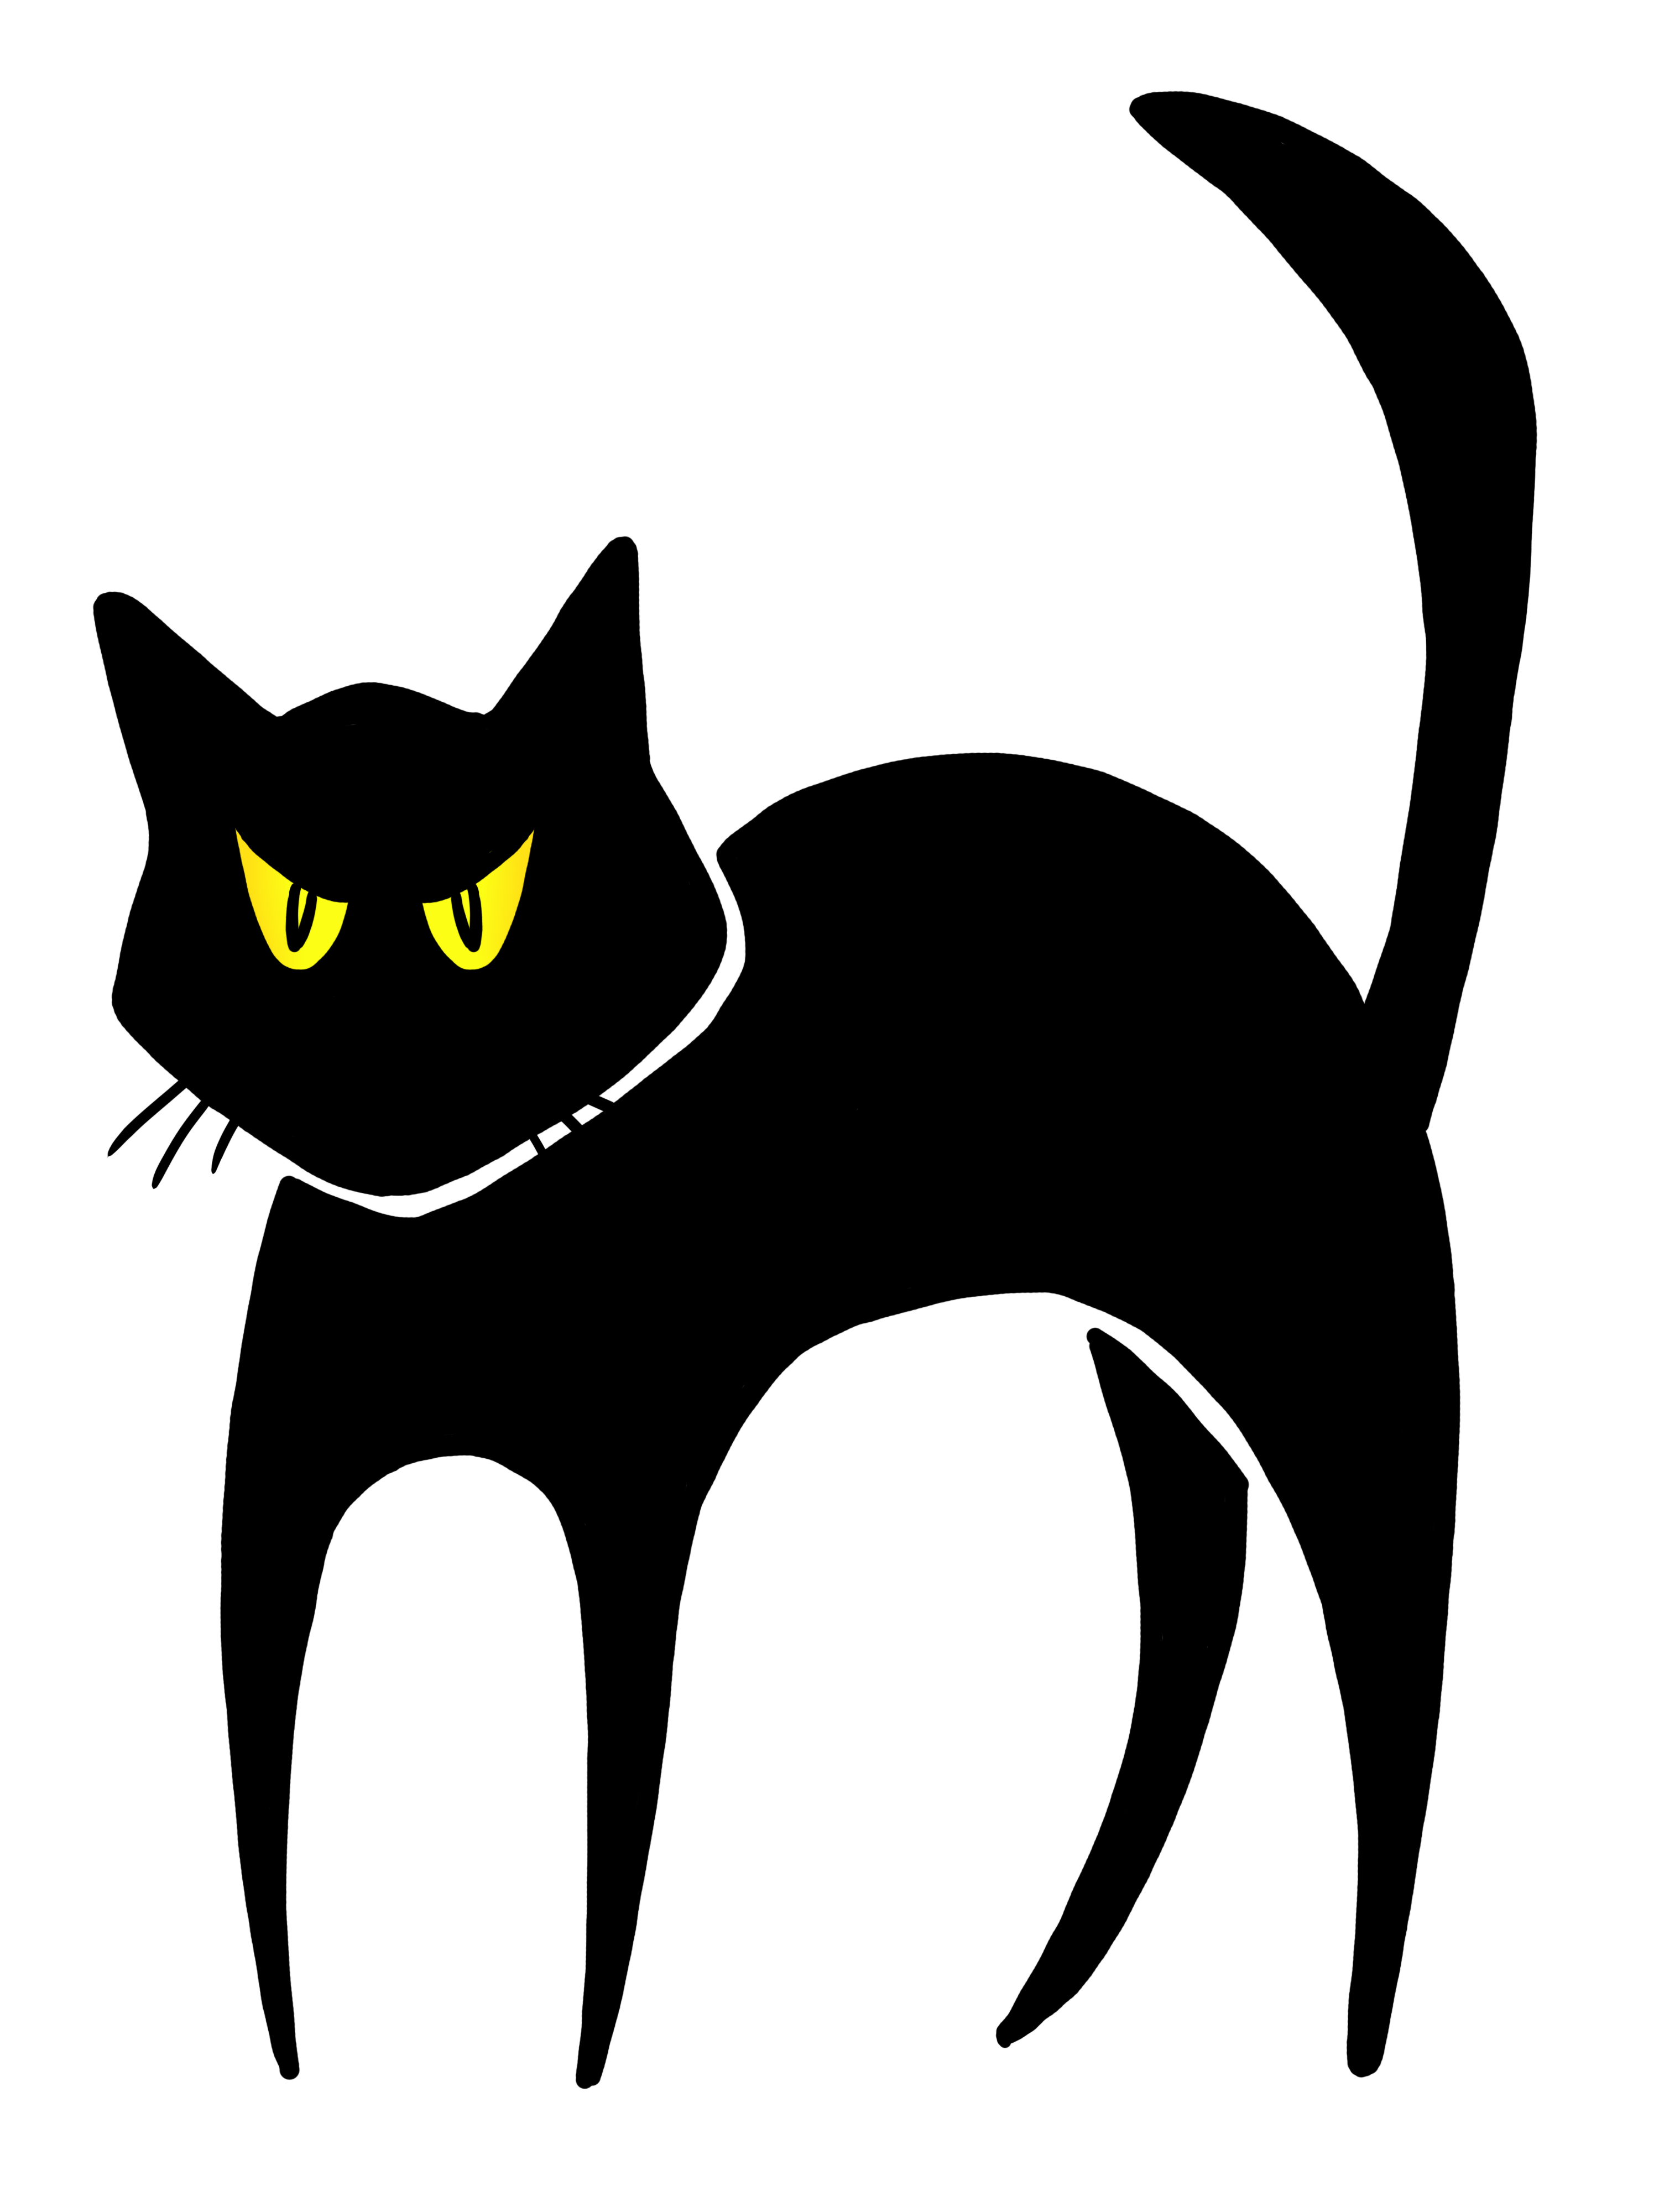 Black Cat Clip Art Clipart Best-Black Cat Clip Art Clipart Best-2